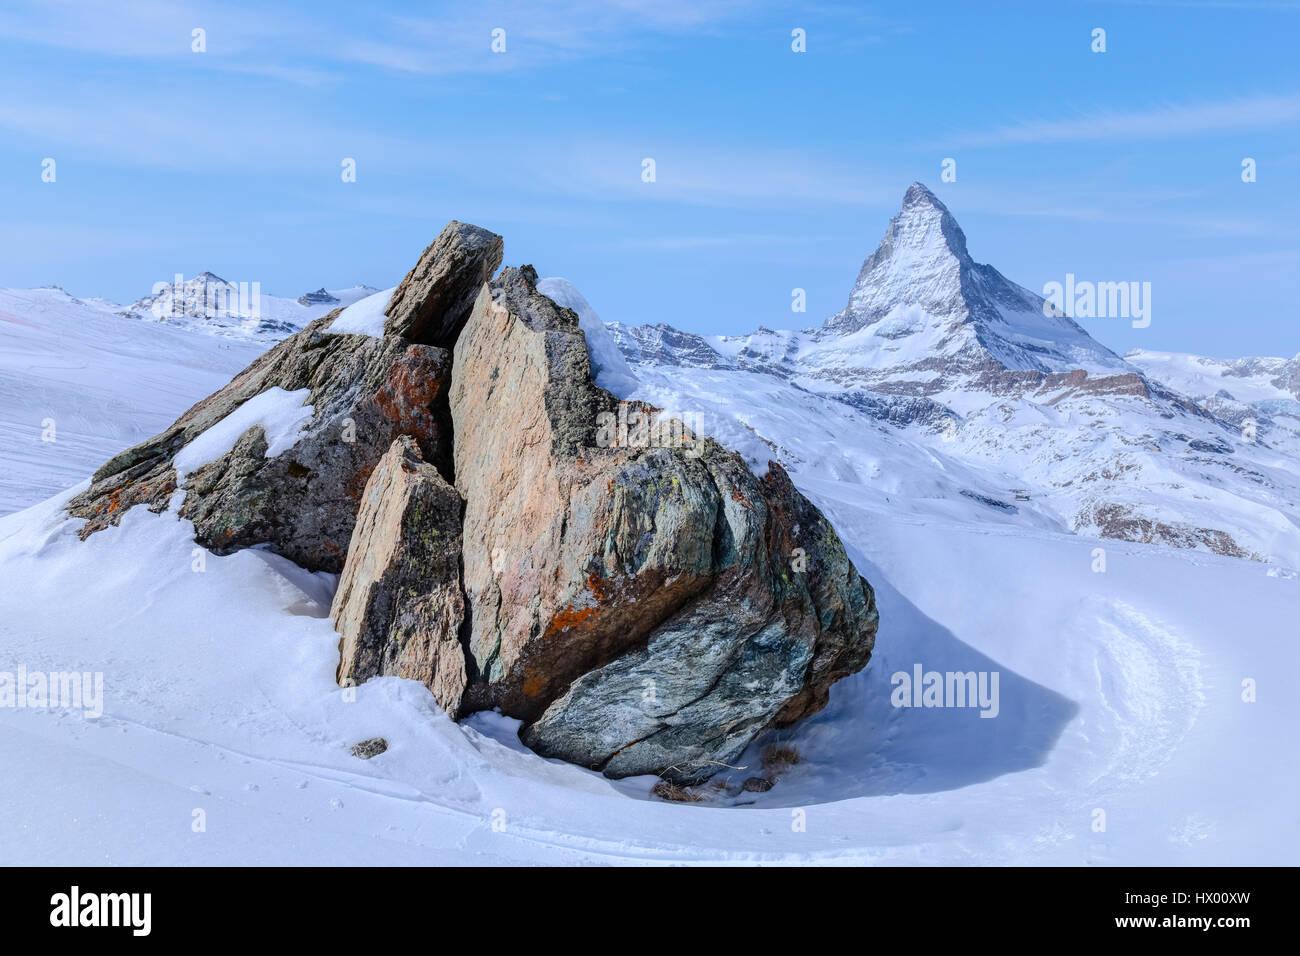 Matterhorn, Zermatt, Gornergrat, Valais, Switzerland, Europe - Stock Image